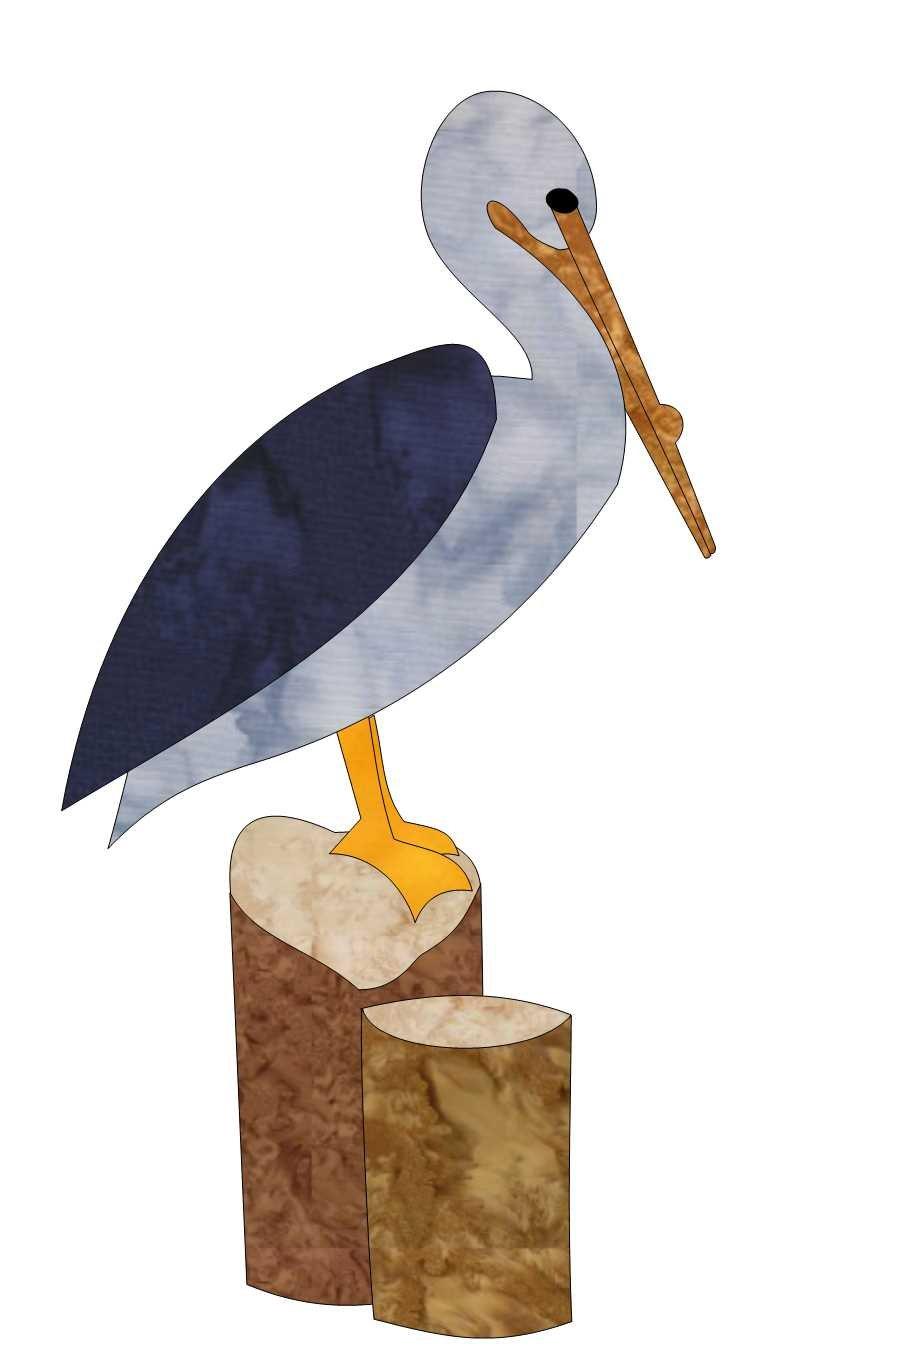 Beach Dreams Block 4 - Pelican on a Piling